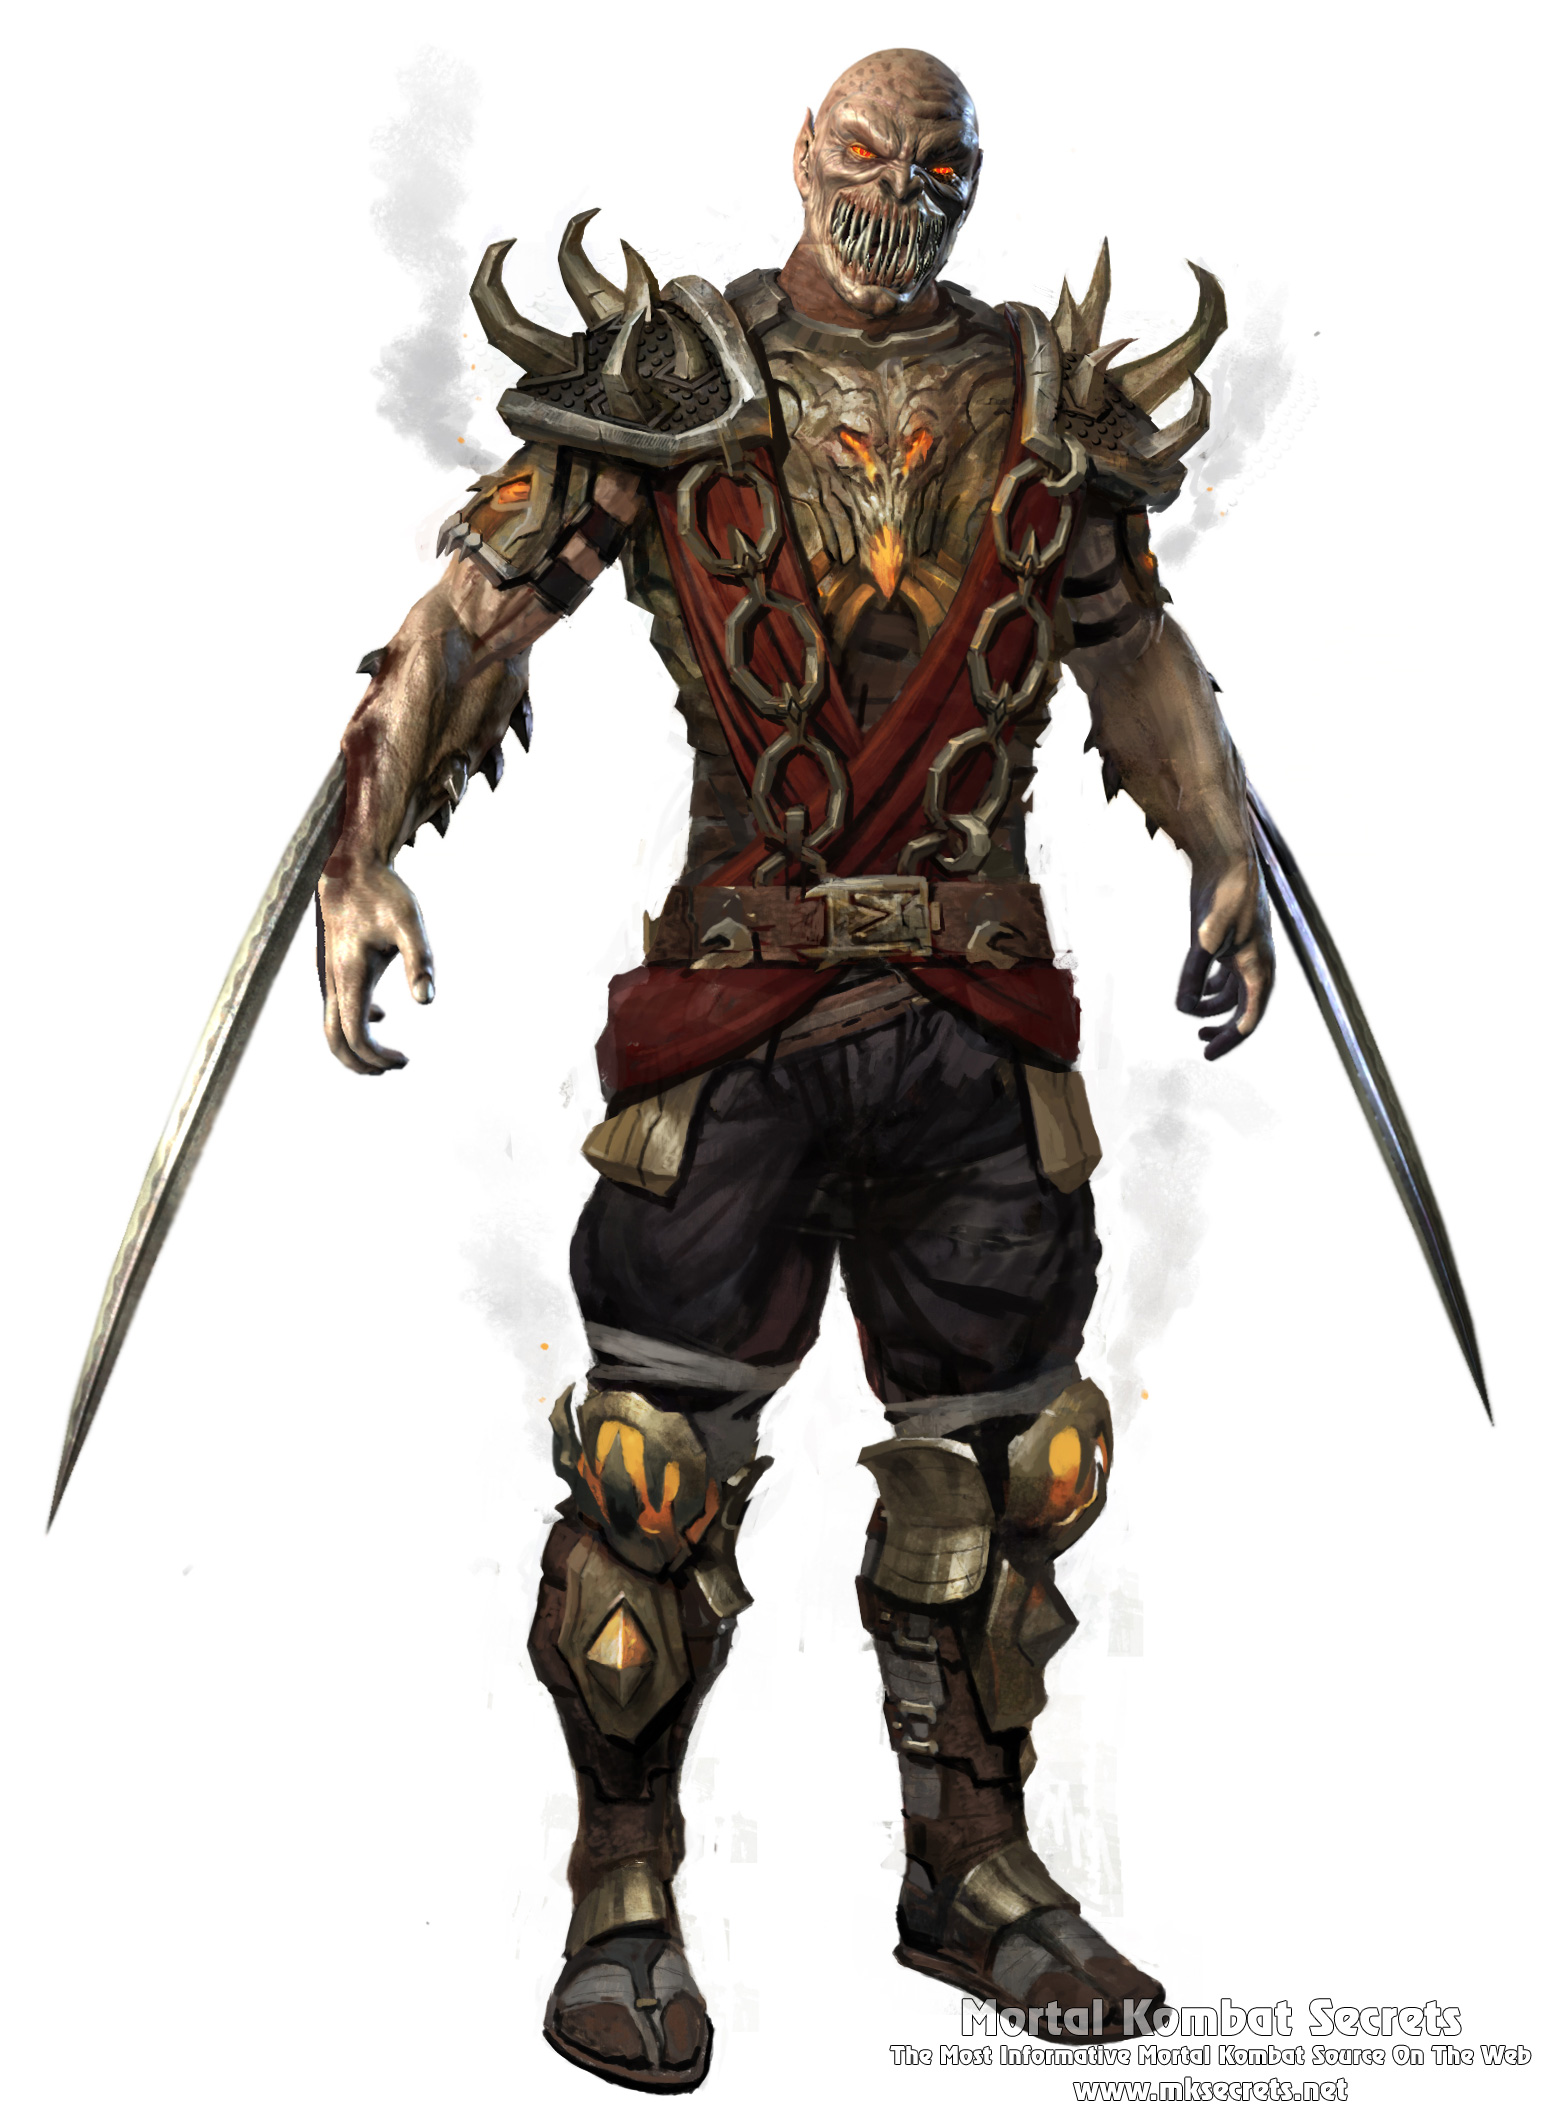 Mortal Kombat 9 (2011) - Character Drawings - Mortal Kombat